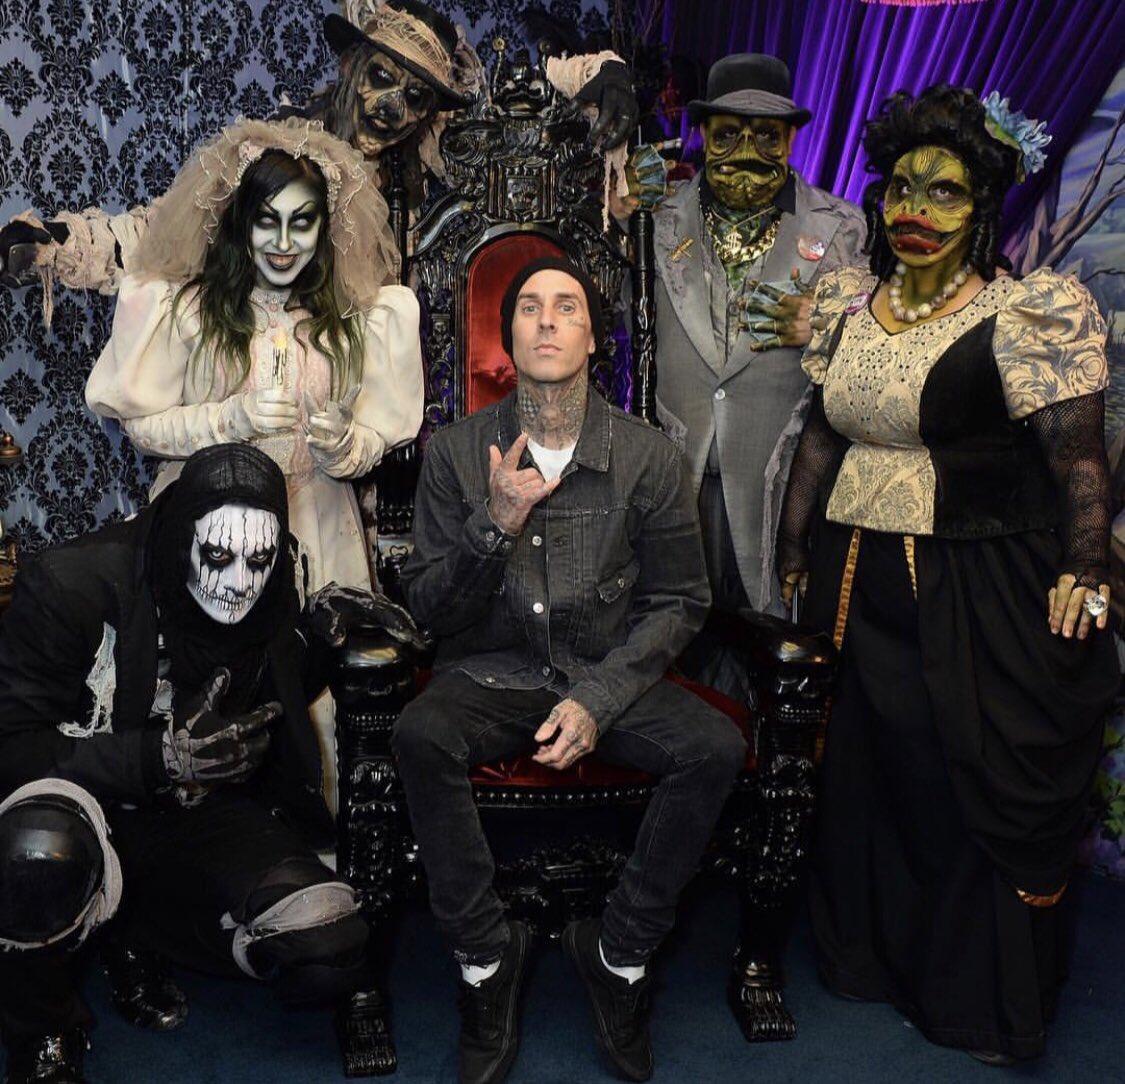 New band photo ???????? @knottsscaryfarm https://t.co/CcMuEjRtOn